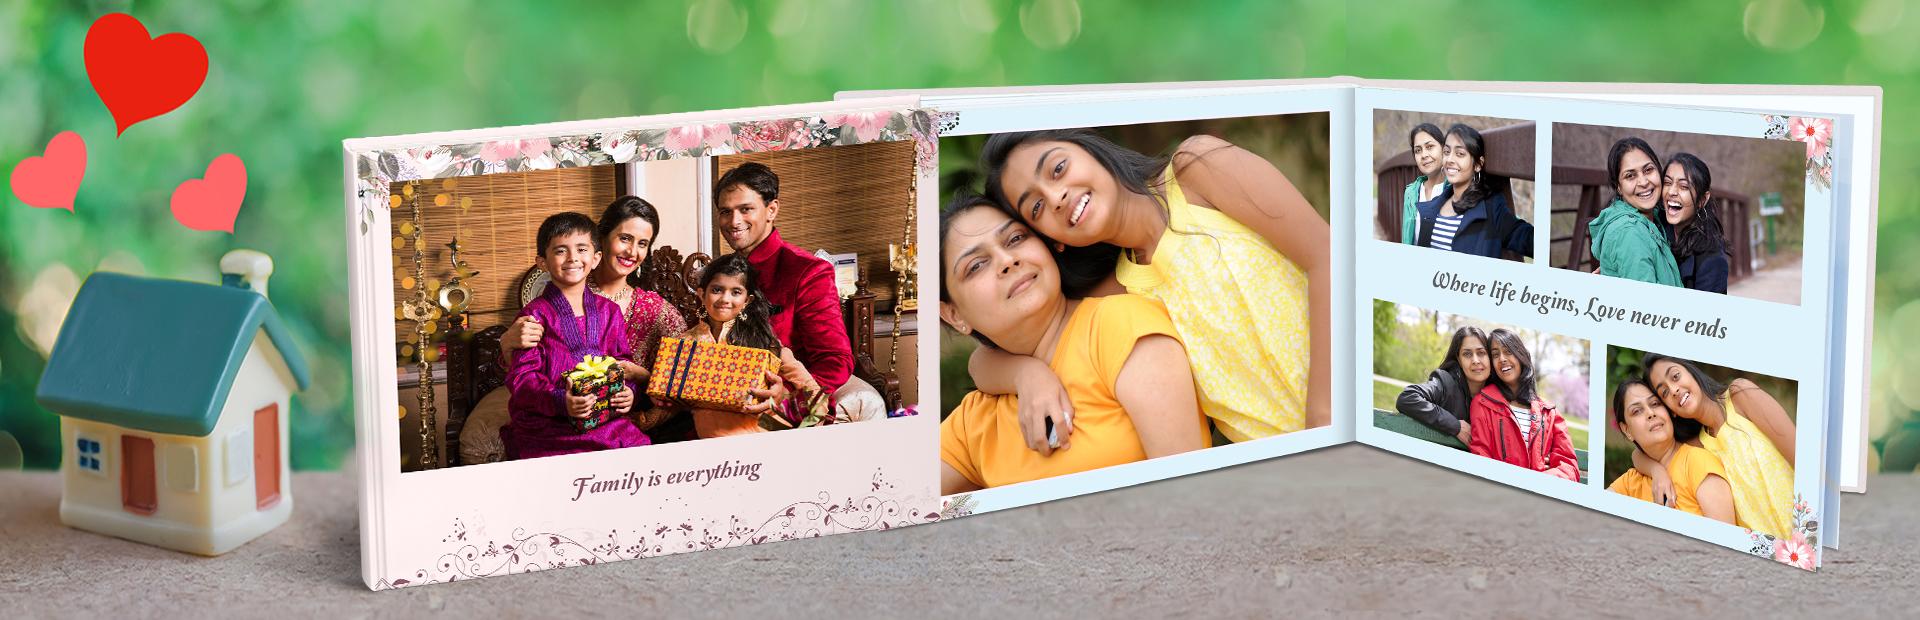 Family Photo Book Printing - Picsy